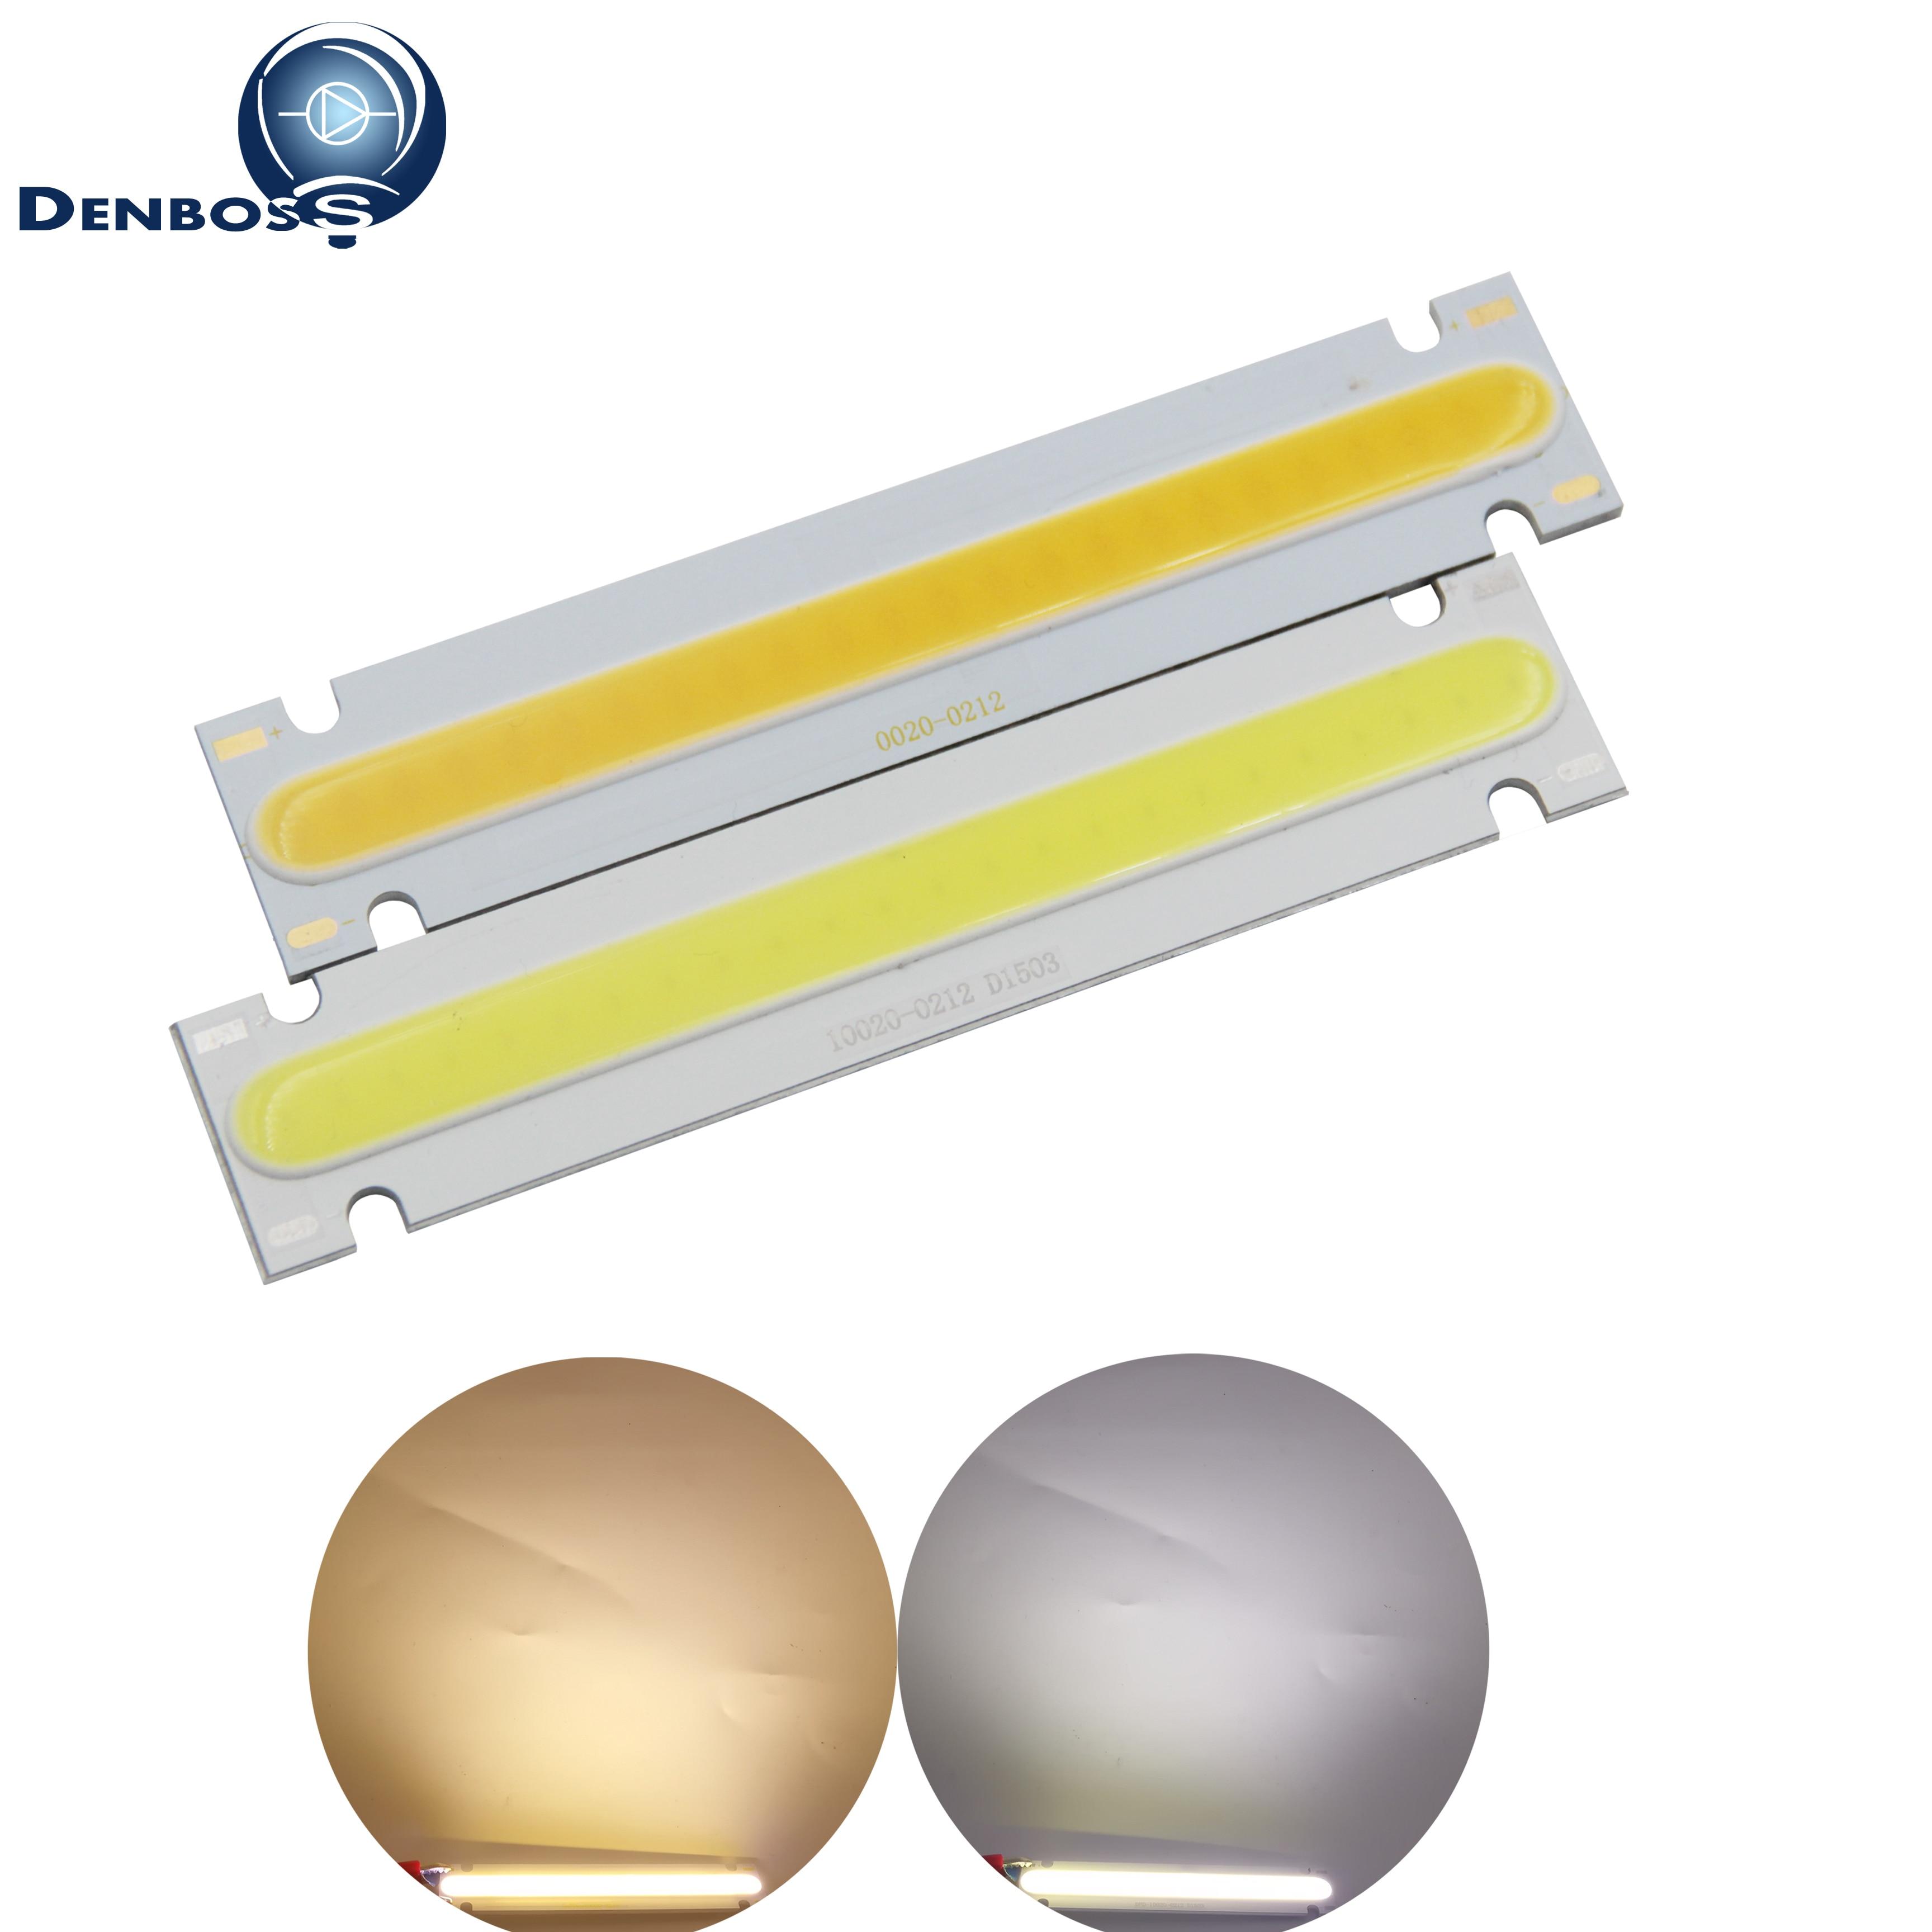 Allcob Manufacturer LED COB Strip Module Light Source Lamp 6V DC White Warm White 100x20mm 5W LED FLIP Chip Bulb For DIY Lamp